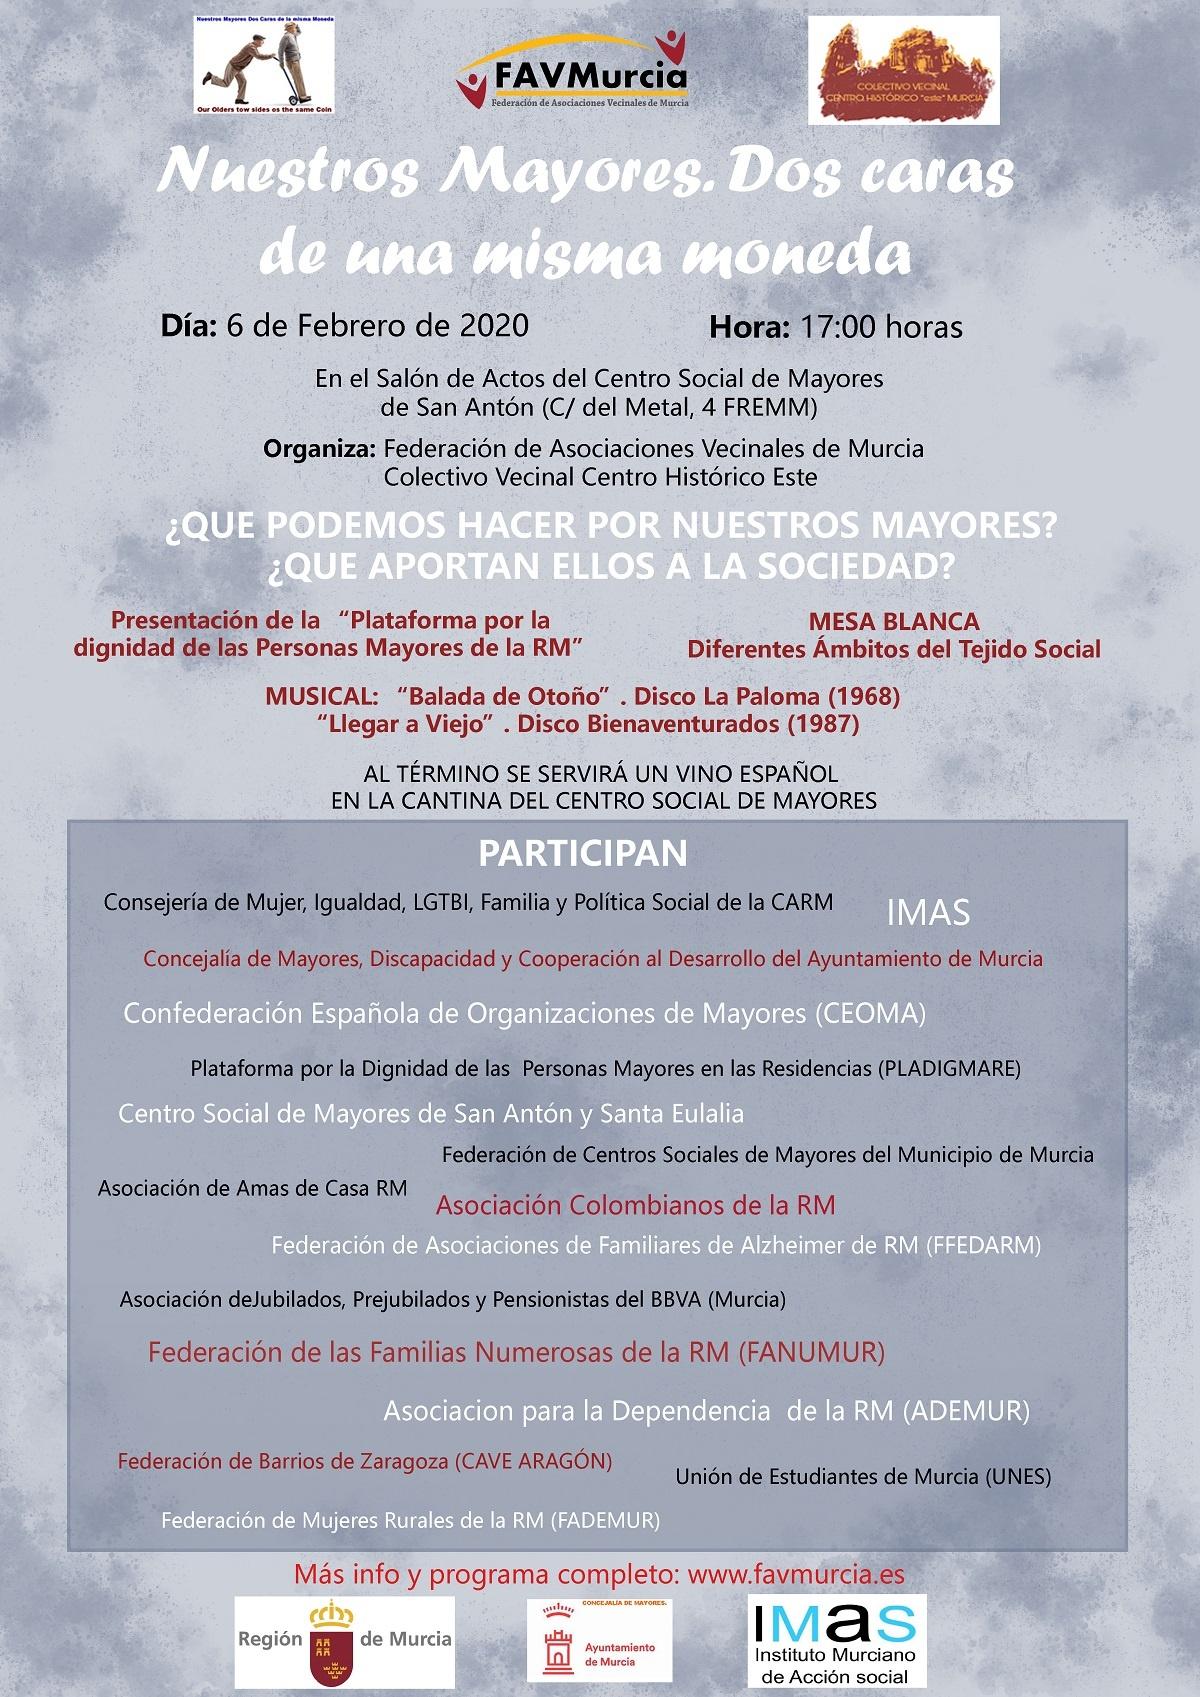 2020-02-06 Evento Mayores - FAVMurcia